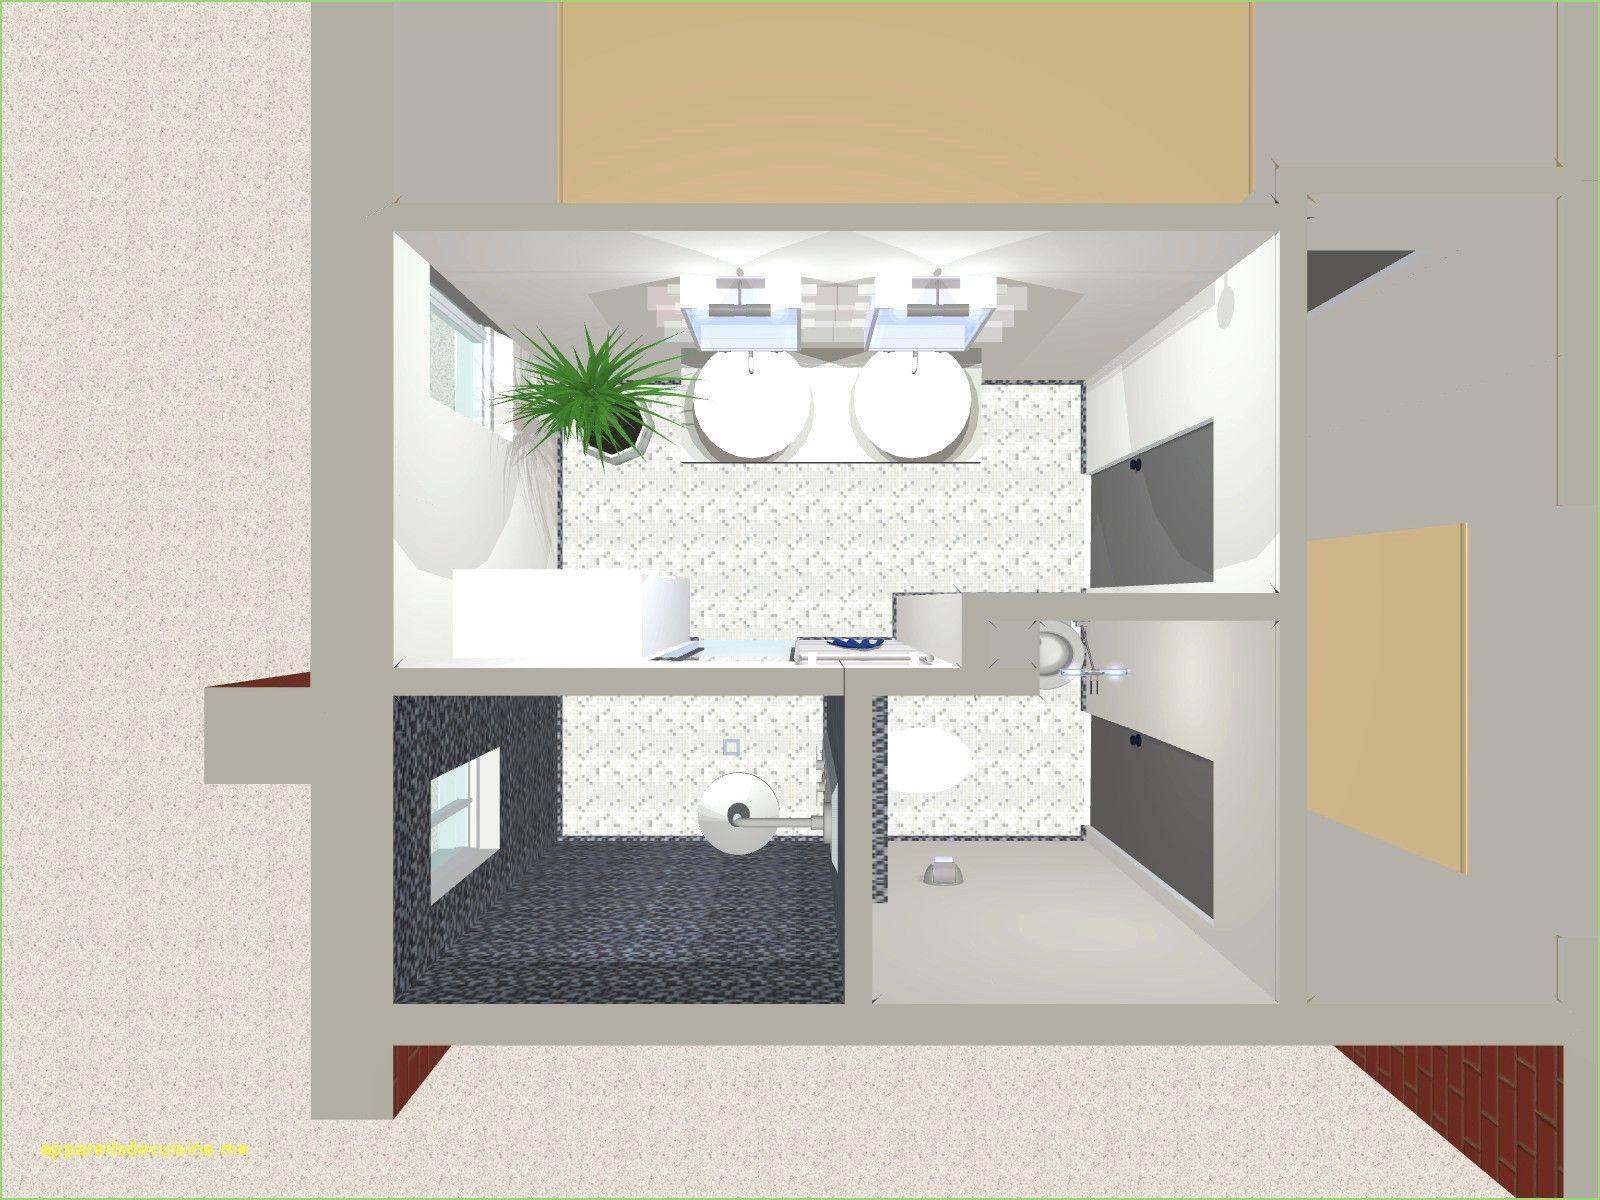 Best Of Logiciel Plan Salle De Bain 3d Gratuit Shelves In Bedroom Rustic Media Cabinets Living Room Shelves